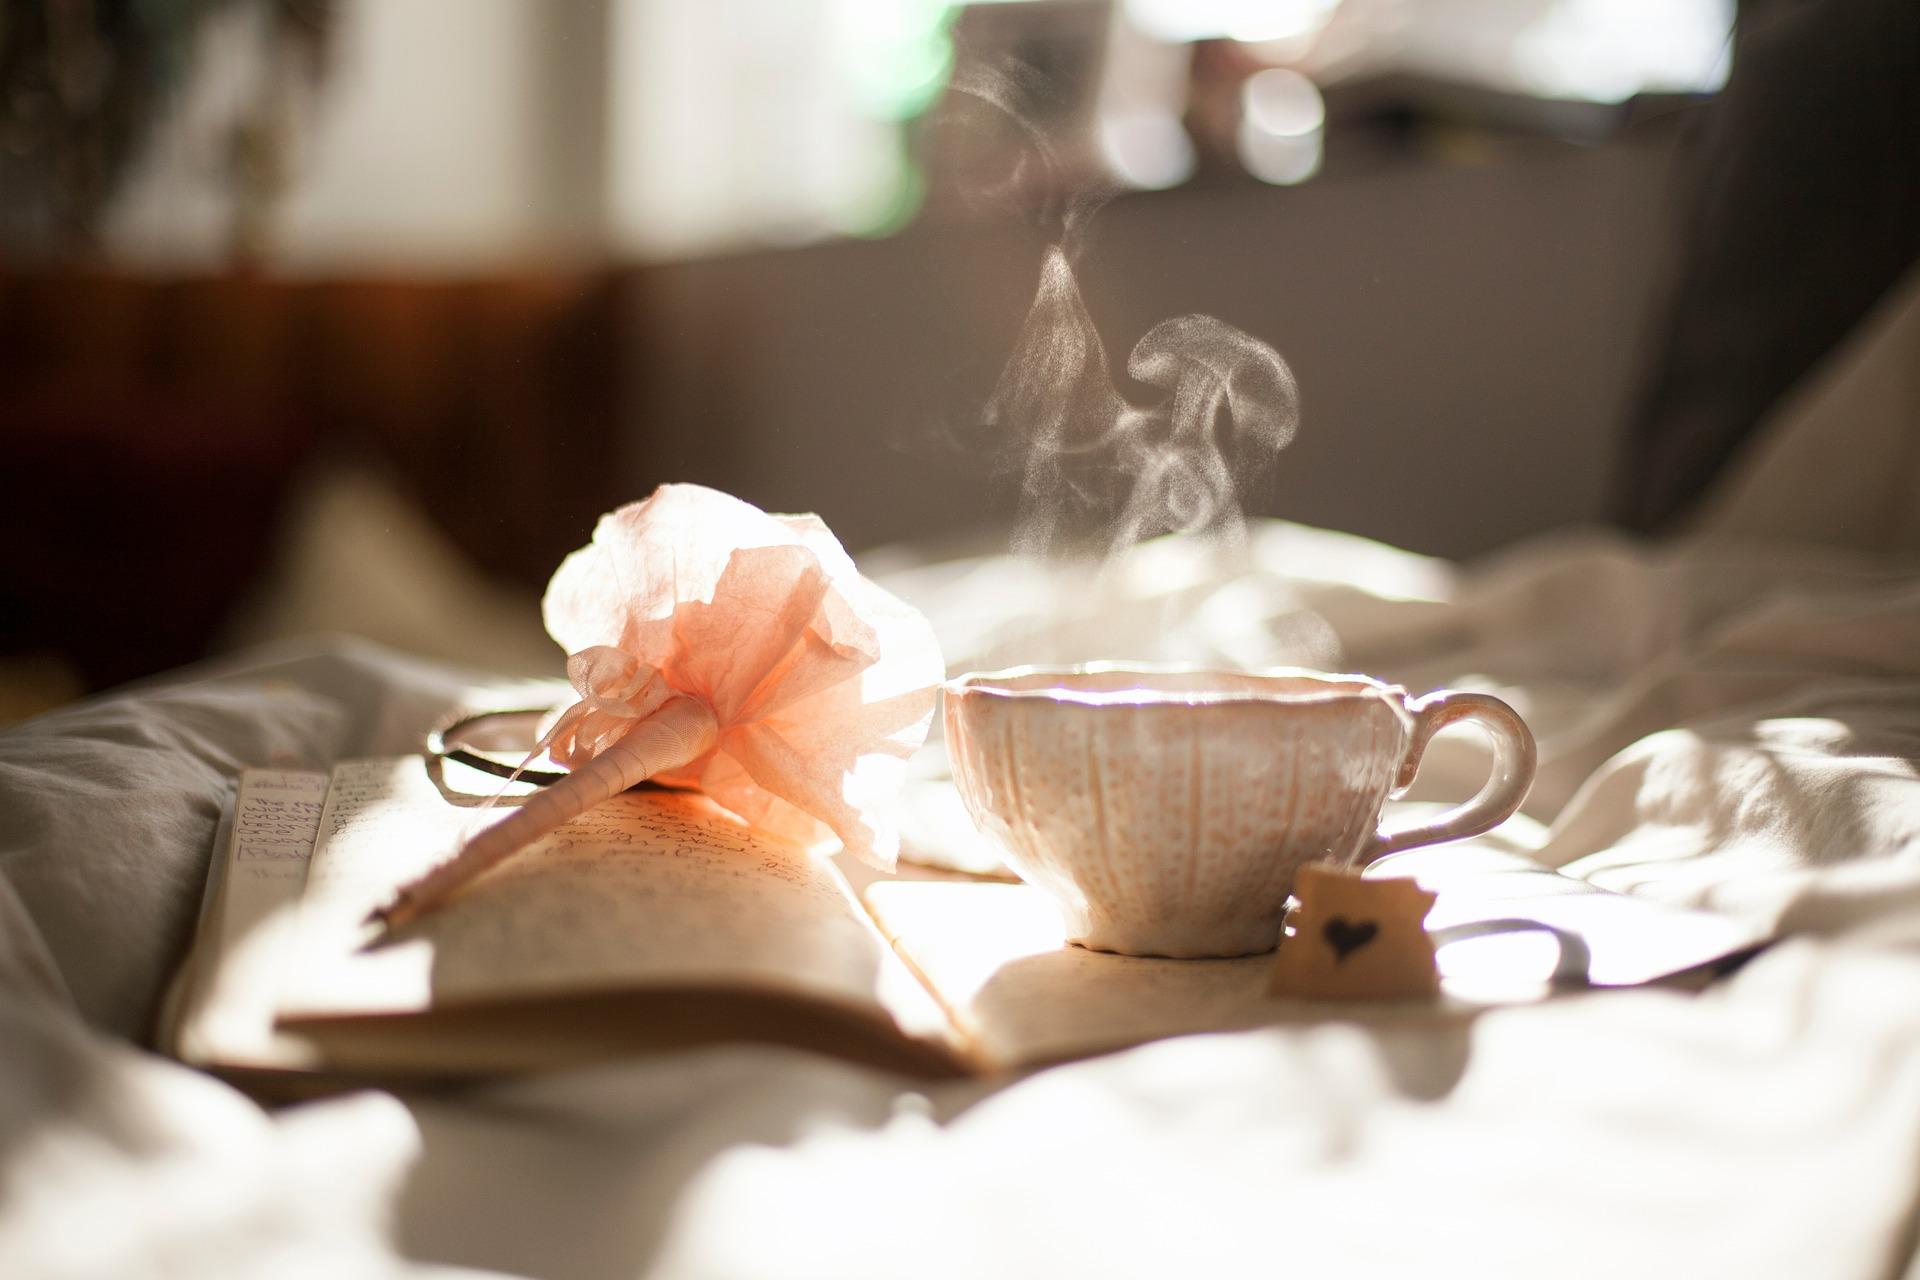 Kaffeetasse, Buch, Stift, Seidenblume, Keks